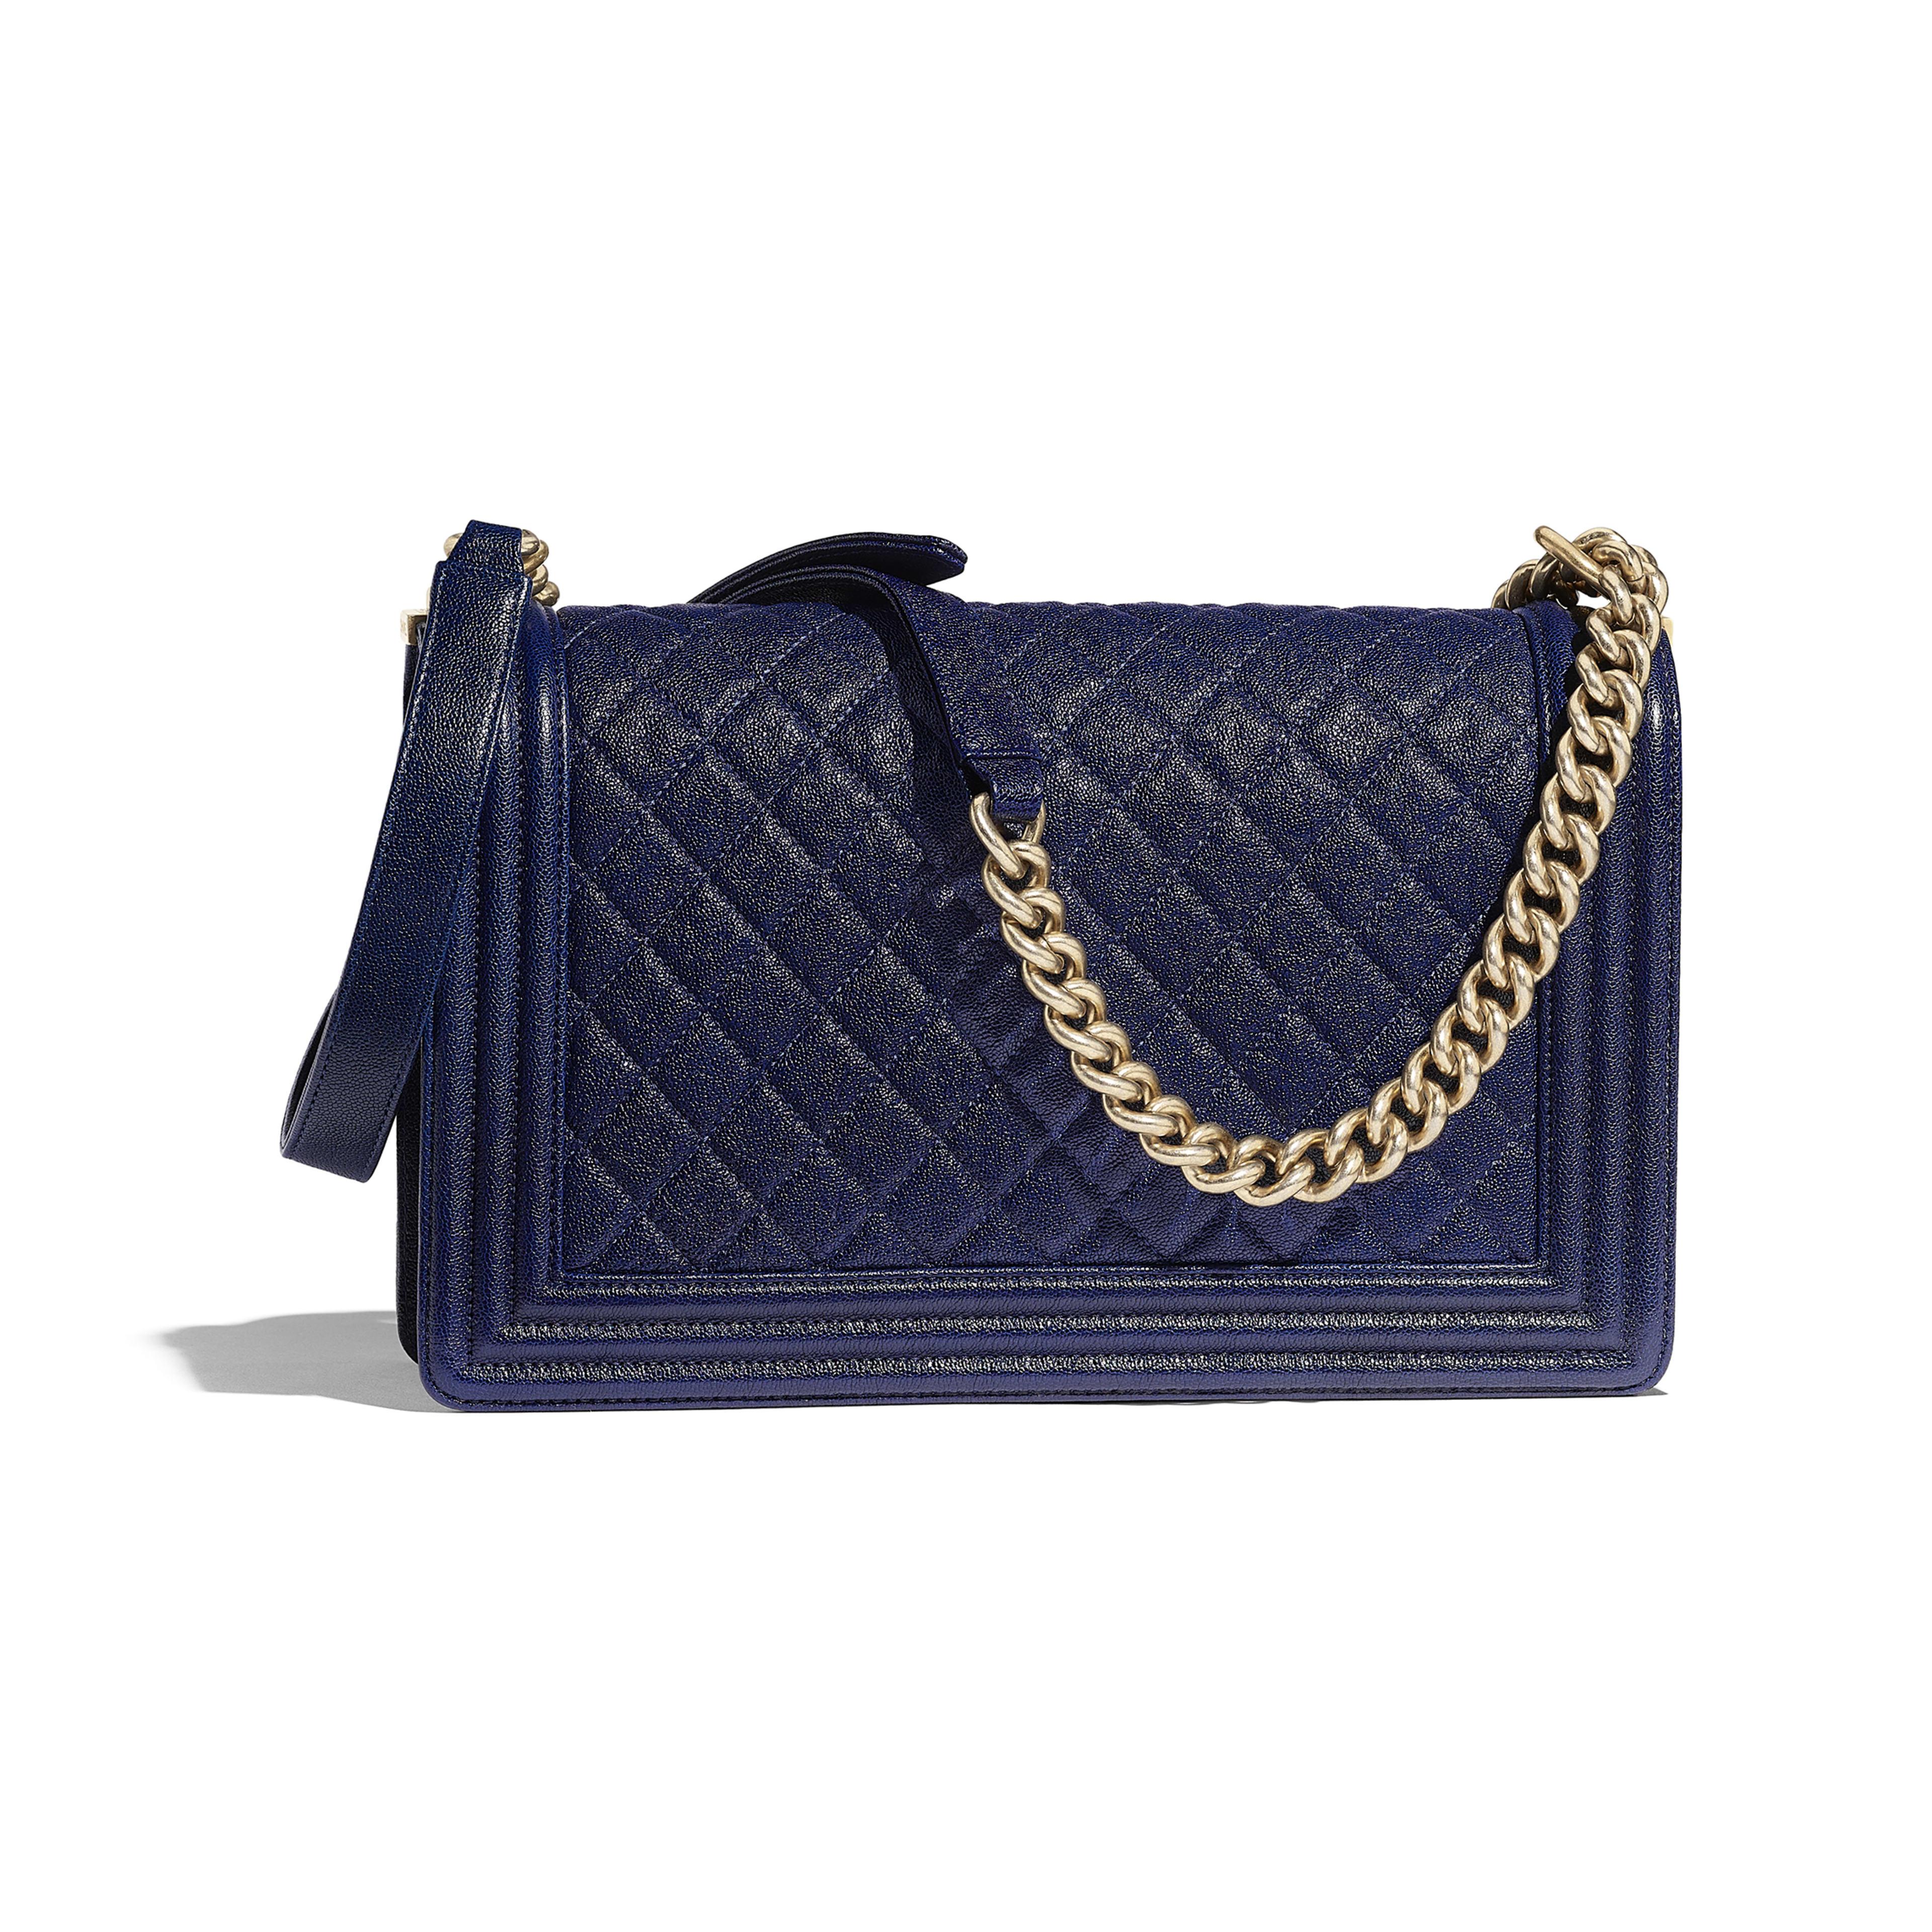 Large BOY CHANEL Handbag - Blue - Grained Calfskin & Gold-Tone Metal - Alternative view - see full sized version